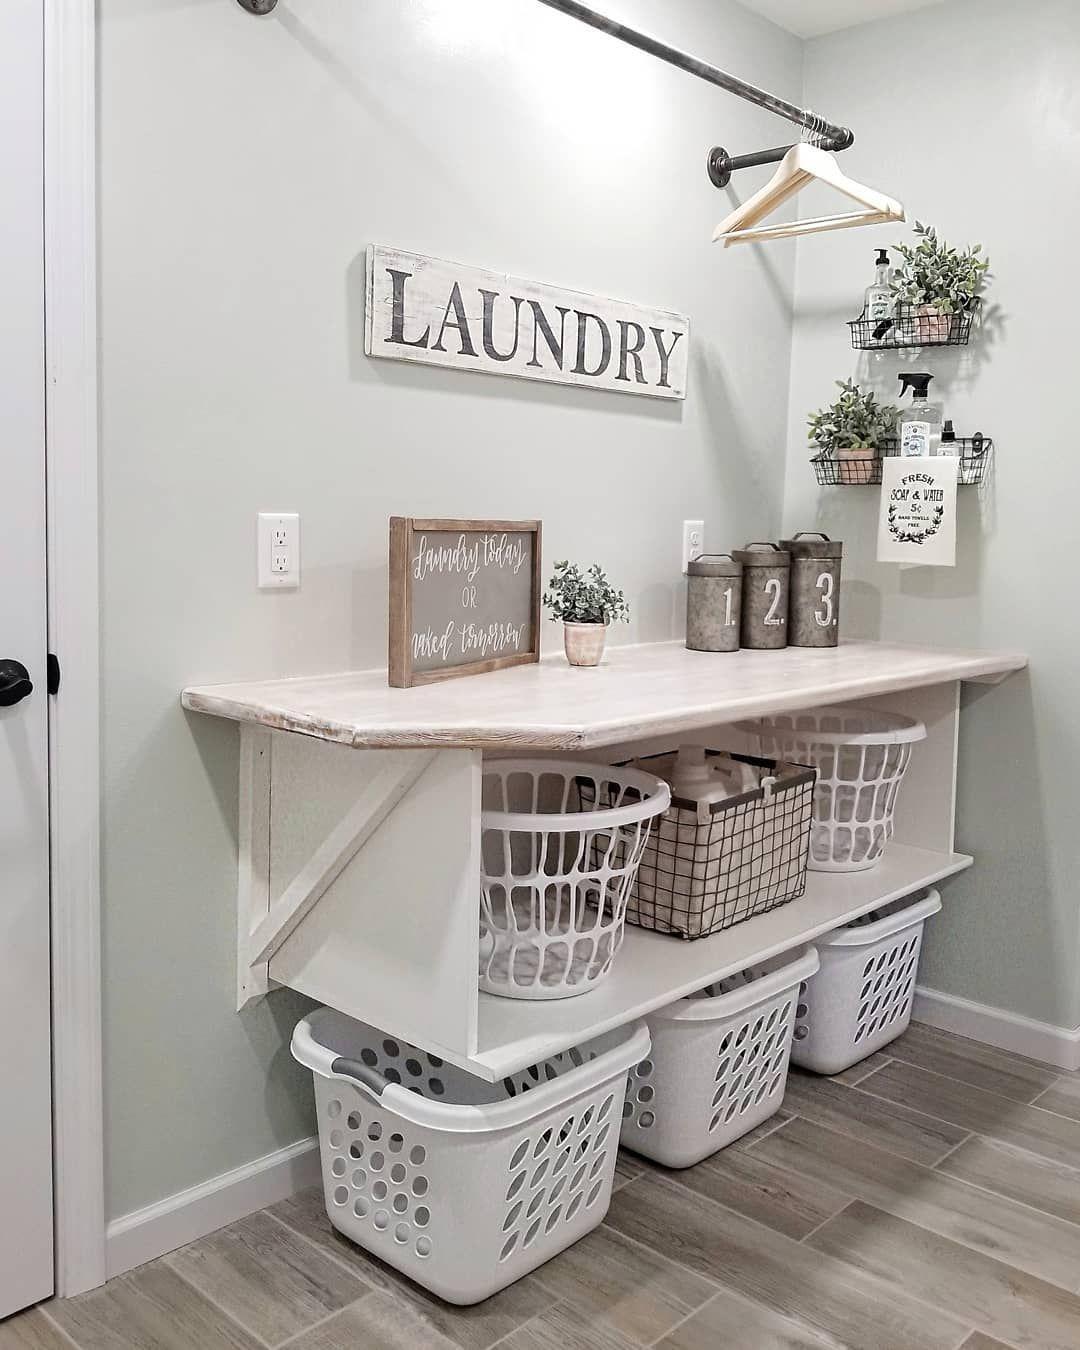 Phenomenal small laundry room drying rack ideas #laundryroomideas #smalllaundryroom #homeimprovement #homedecorideas #laundry